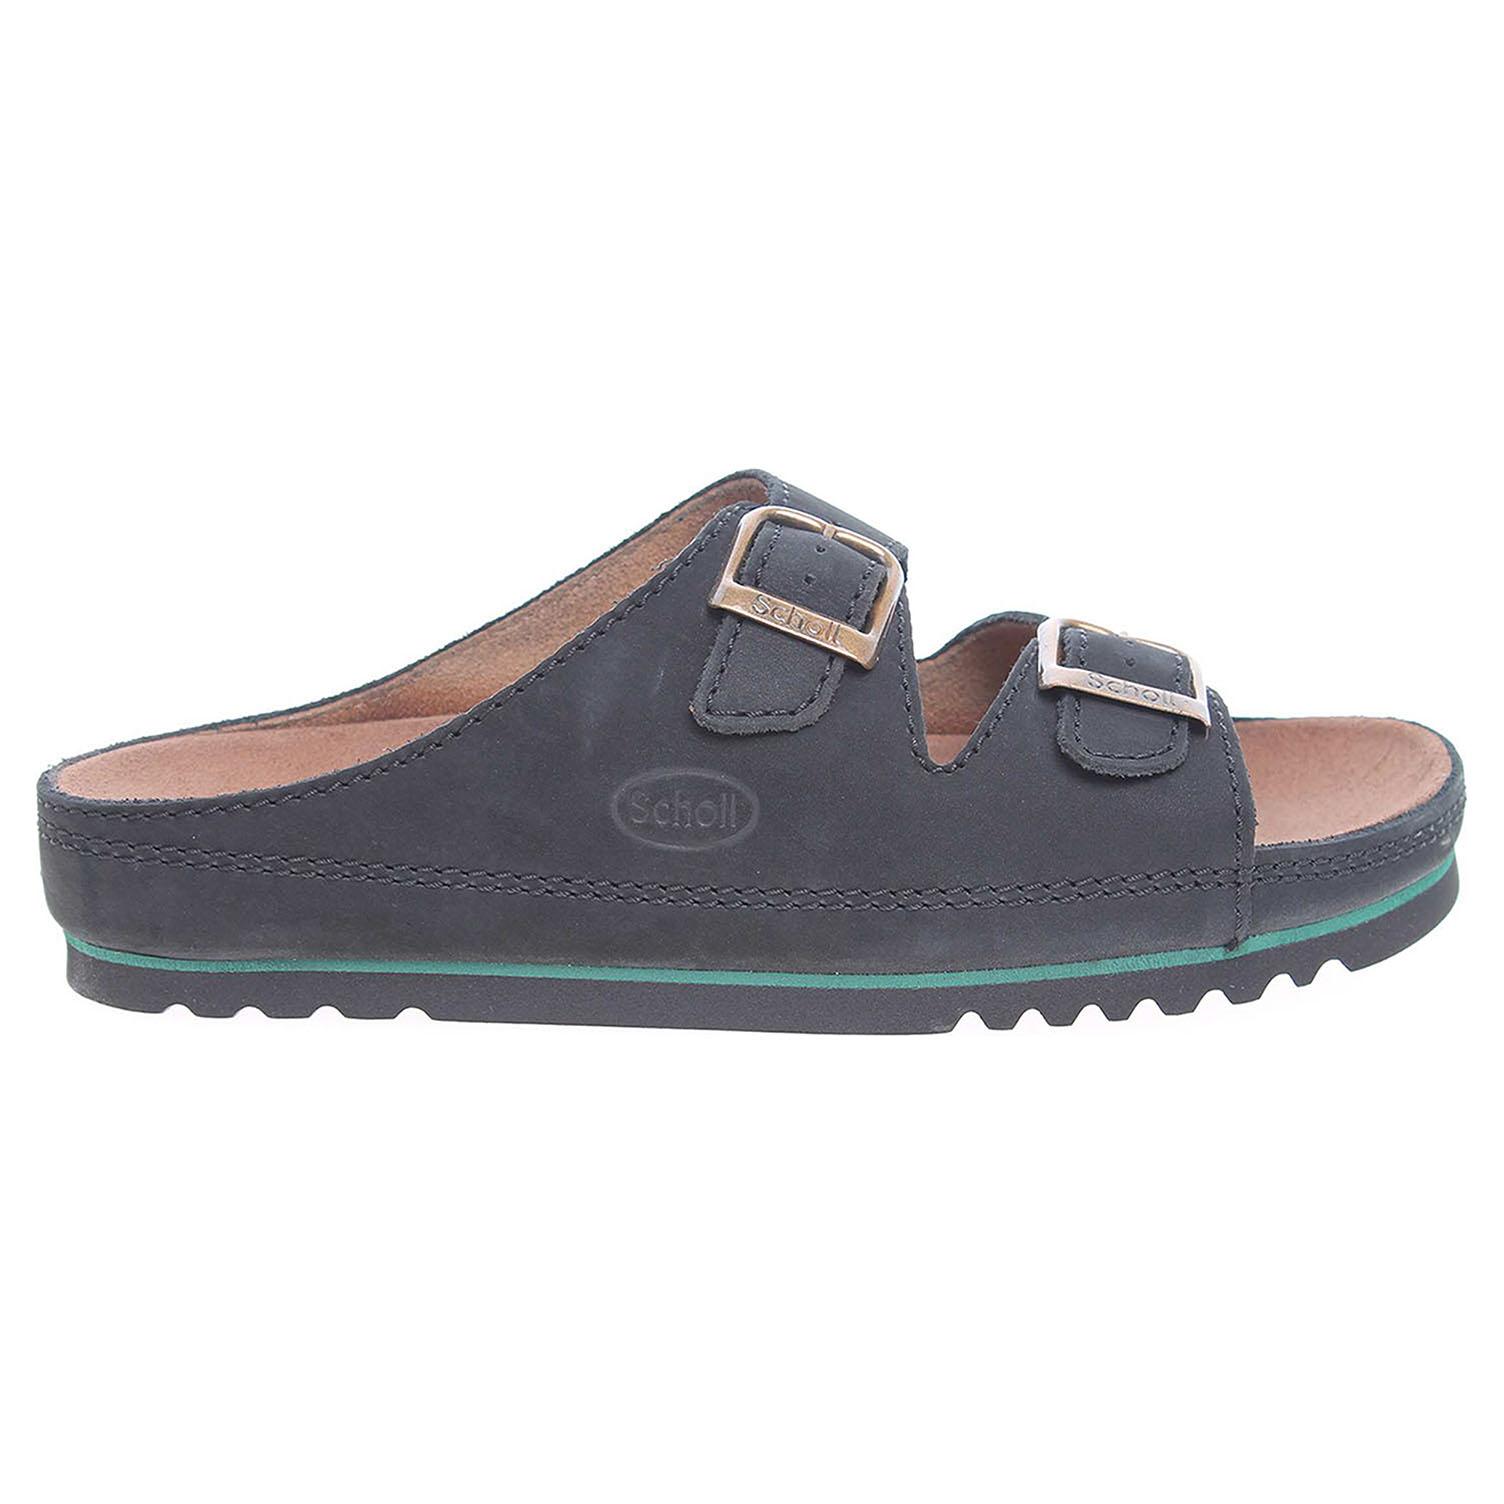 Ecco Scholl pánské pantofle F21531 1004 Air Bag černé 24800255